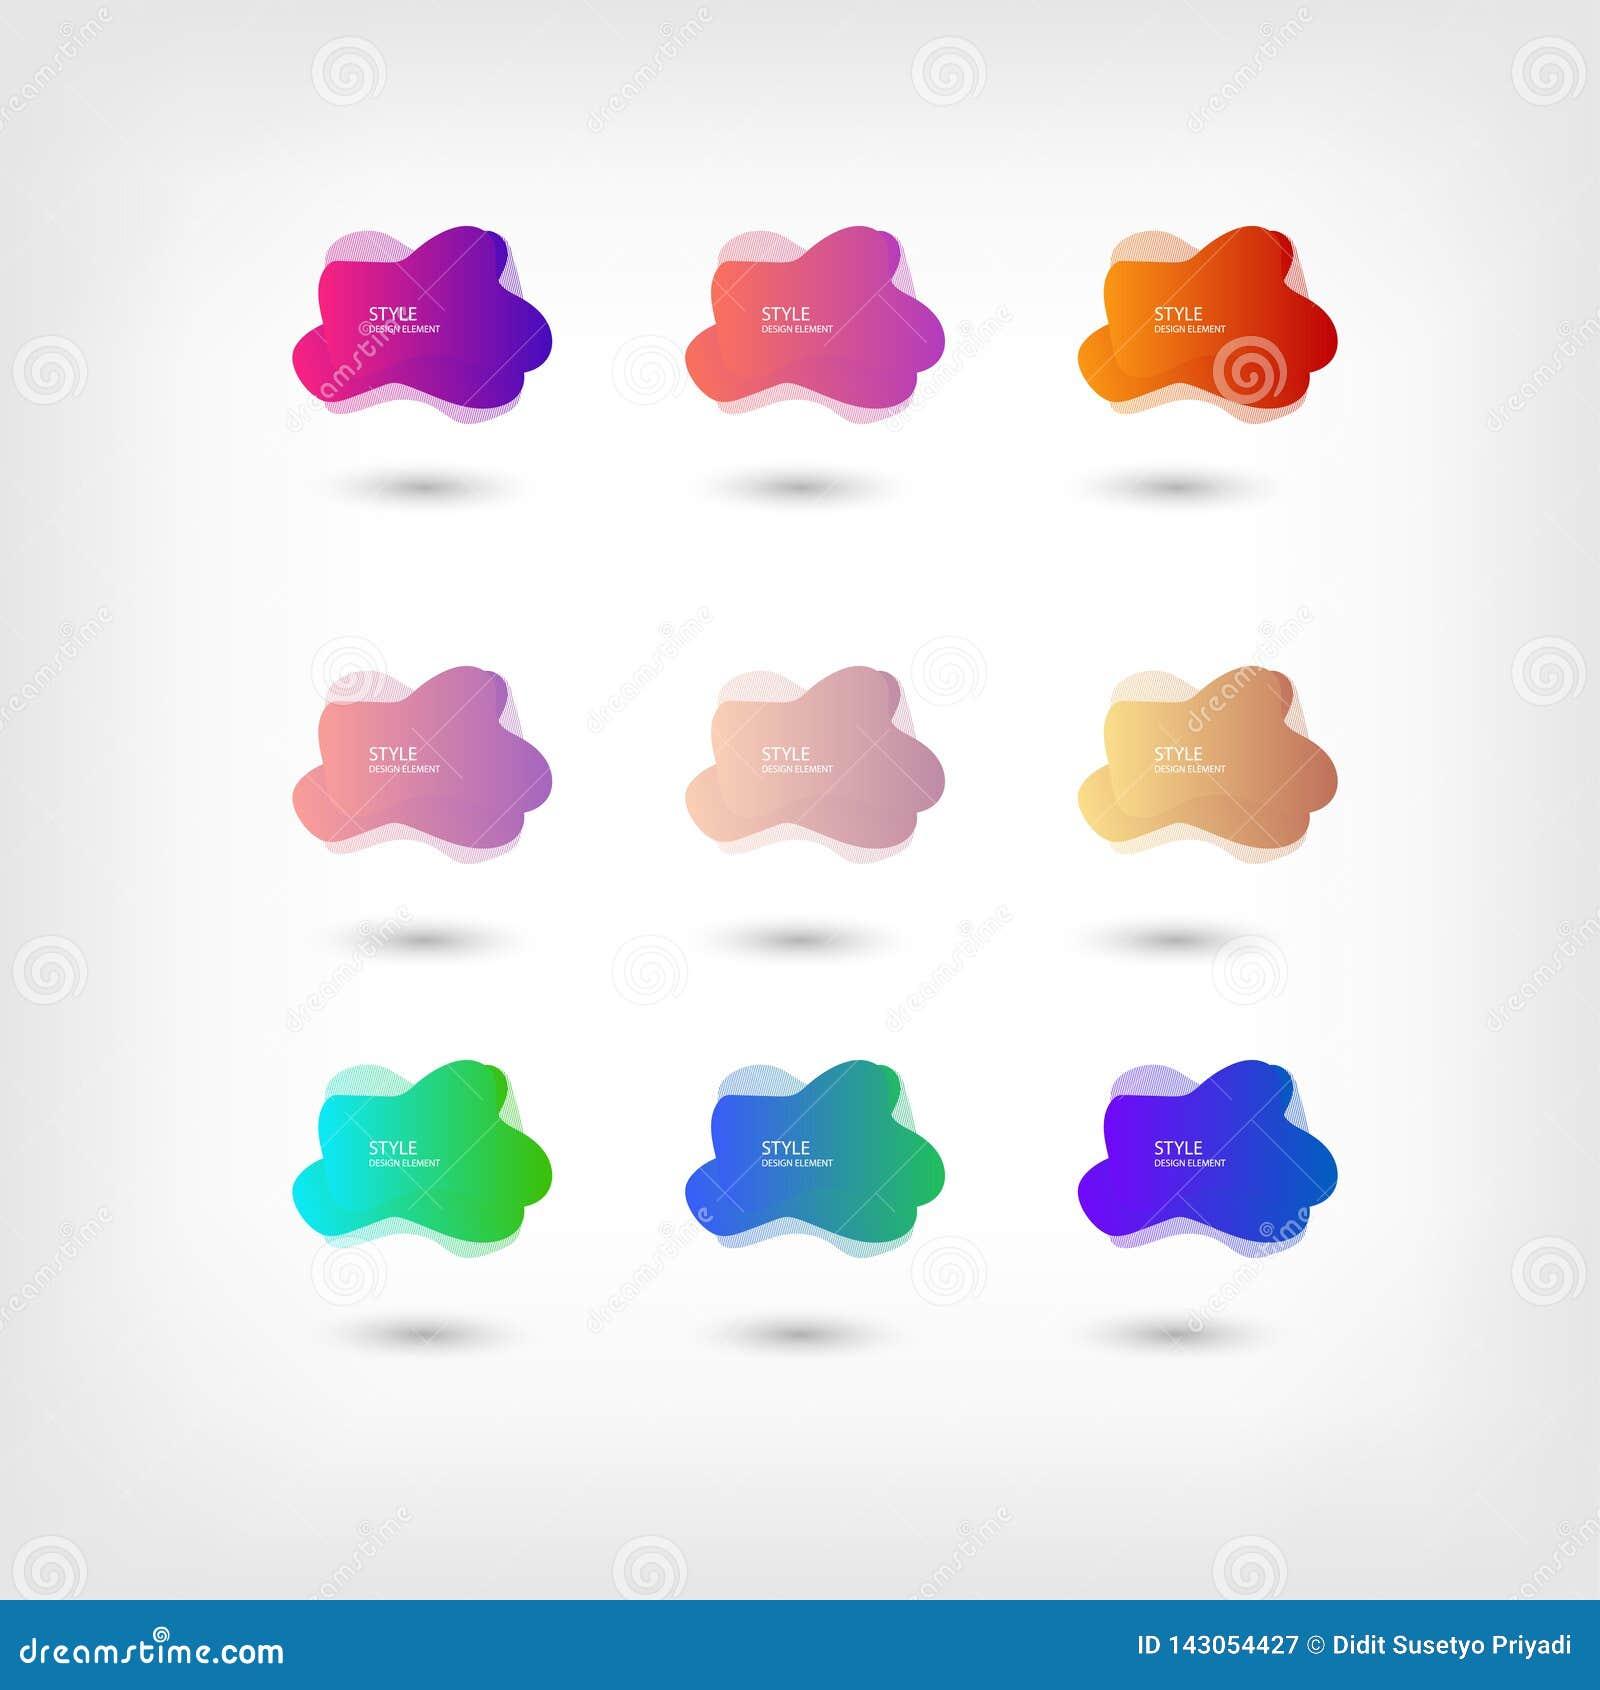 Color abstract liquid shape halftone patterns fluid color overlap gradient background. Vector creative neon color splash shapes